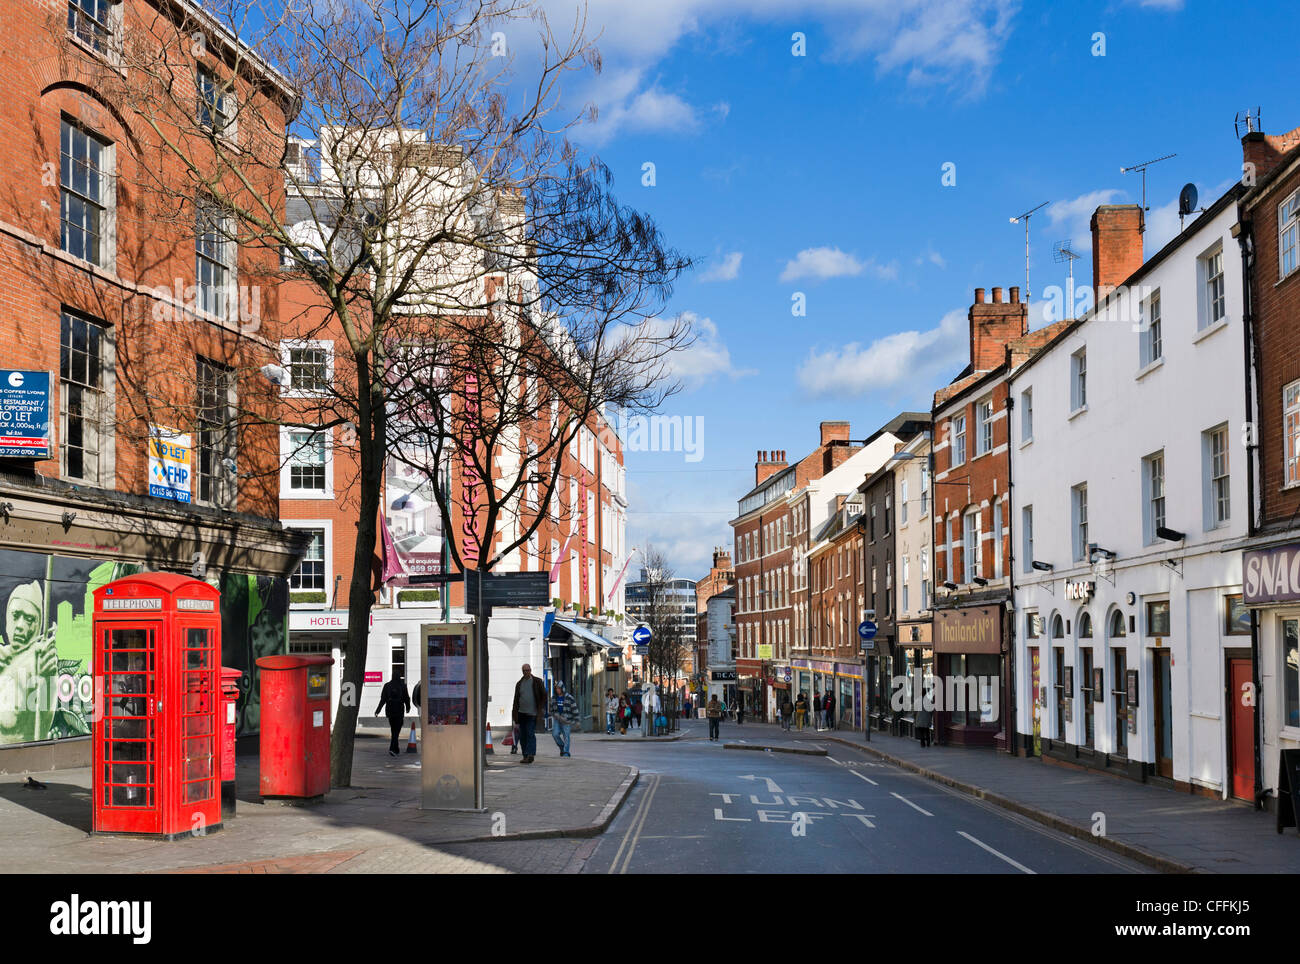 Carlton Street in the Lace Market district, Nottingham, Nottinghamshire, England, UK - Stock Image